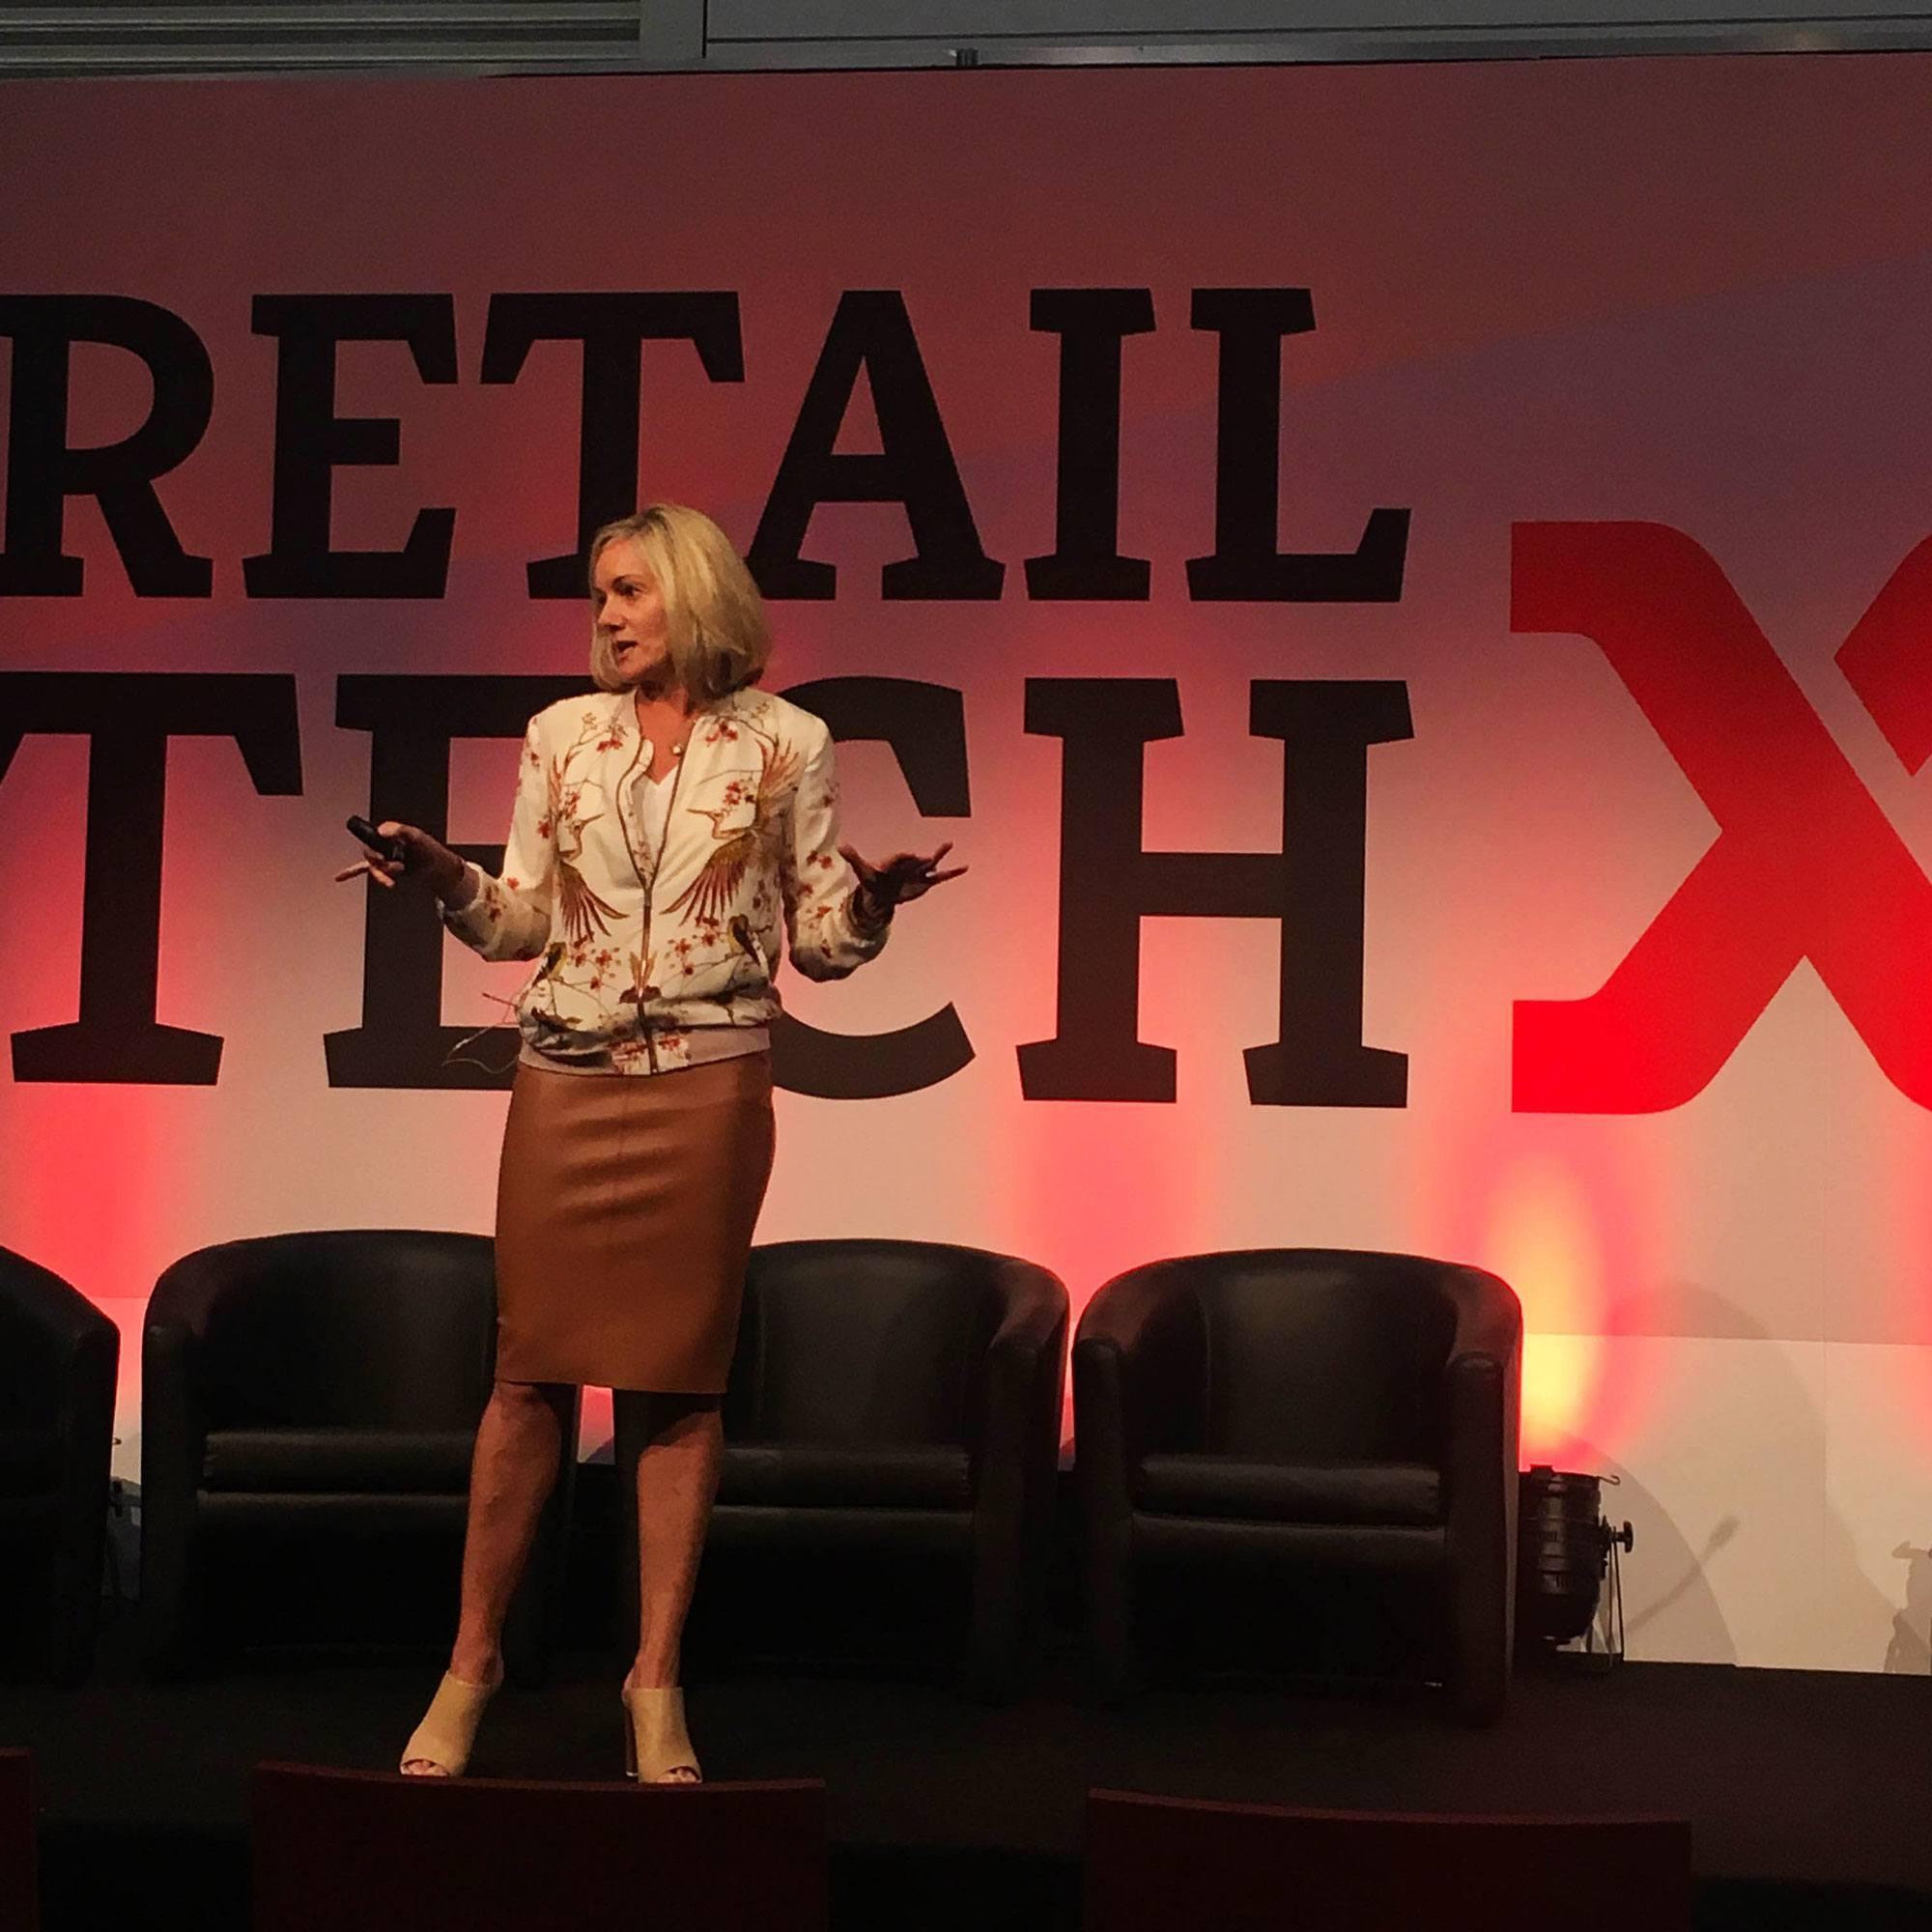 Retail-Tech-X-2016.jpg